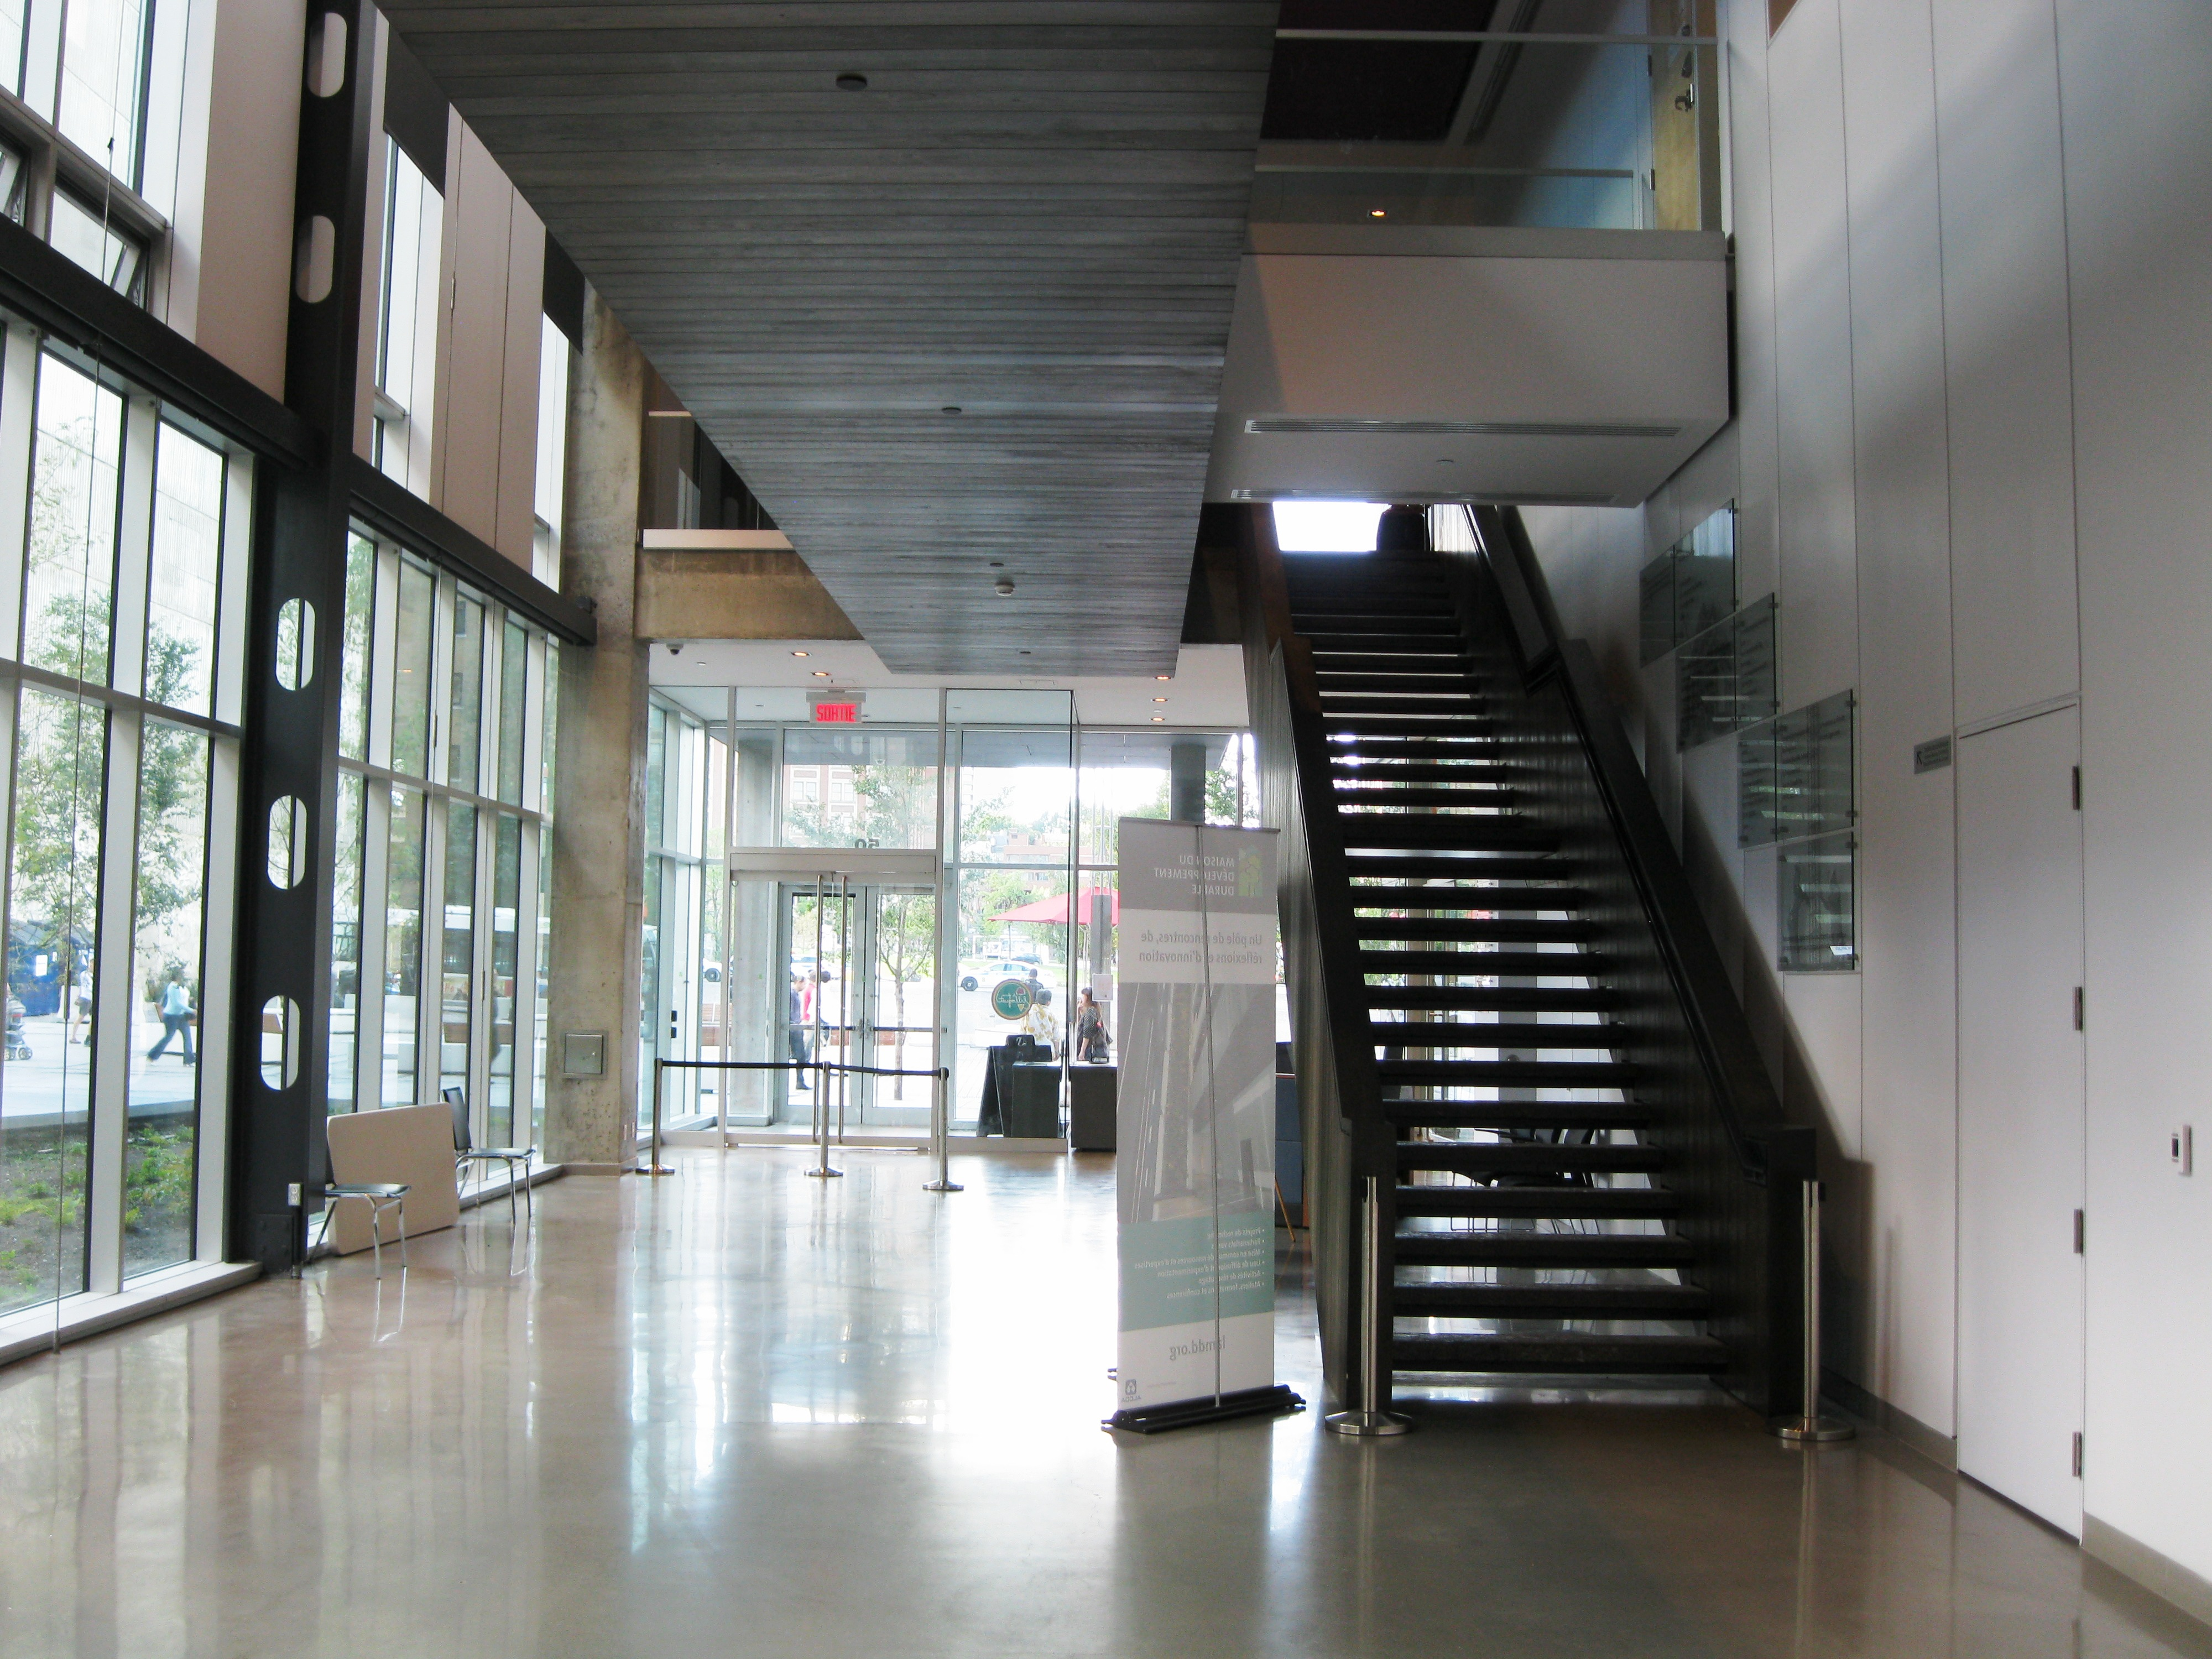 File maison du developpement durable wikimedia commons - Maison du developpement durable ...